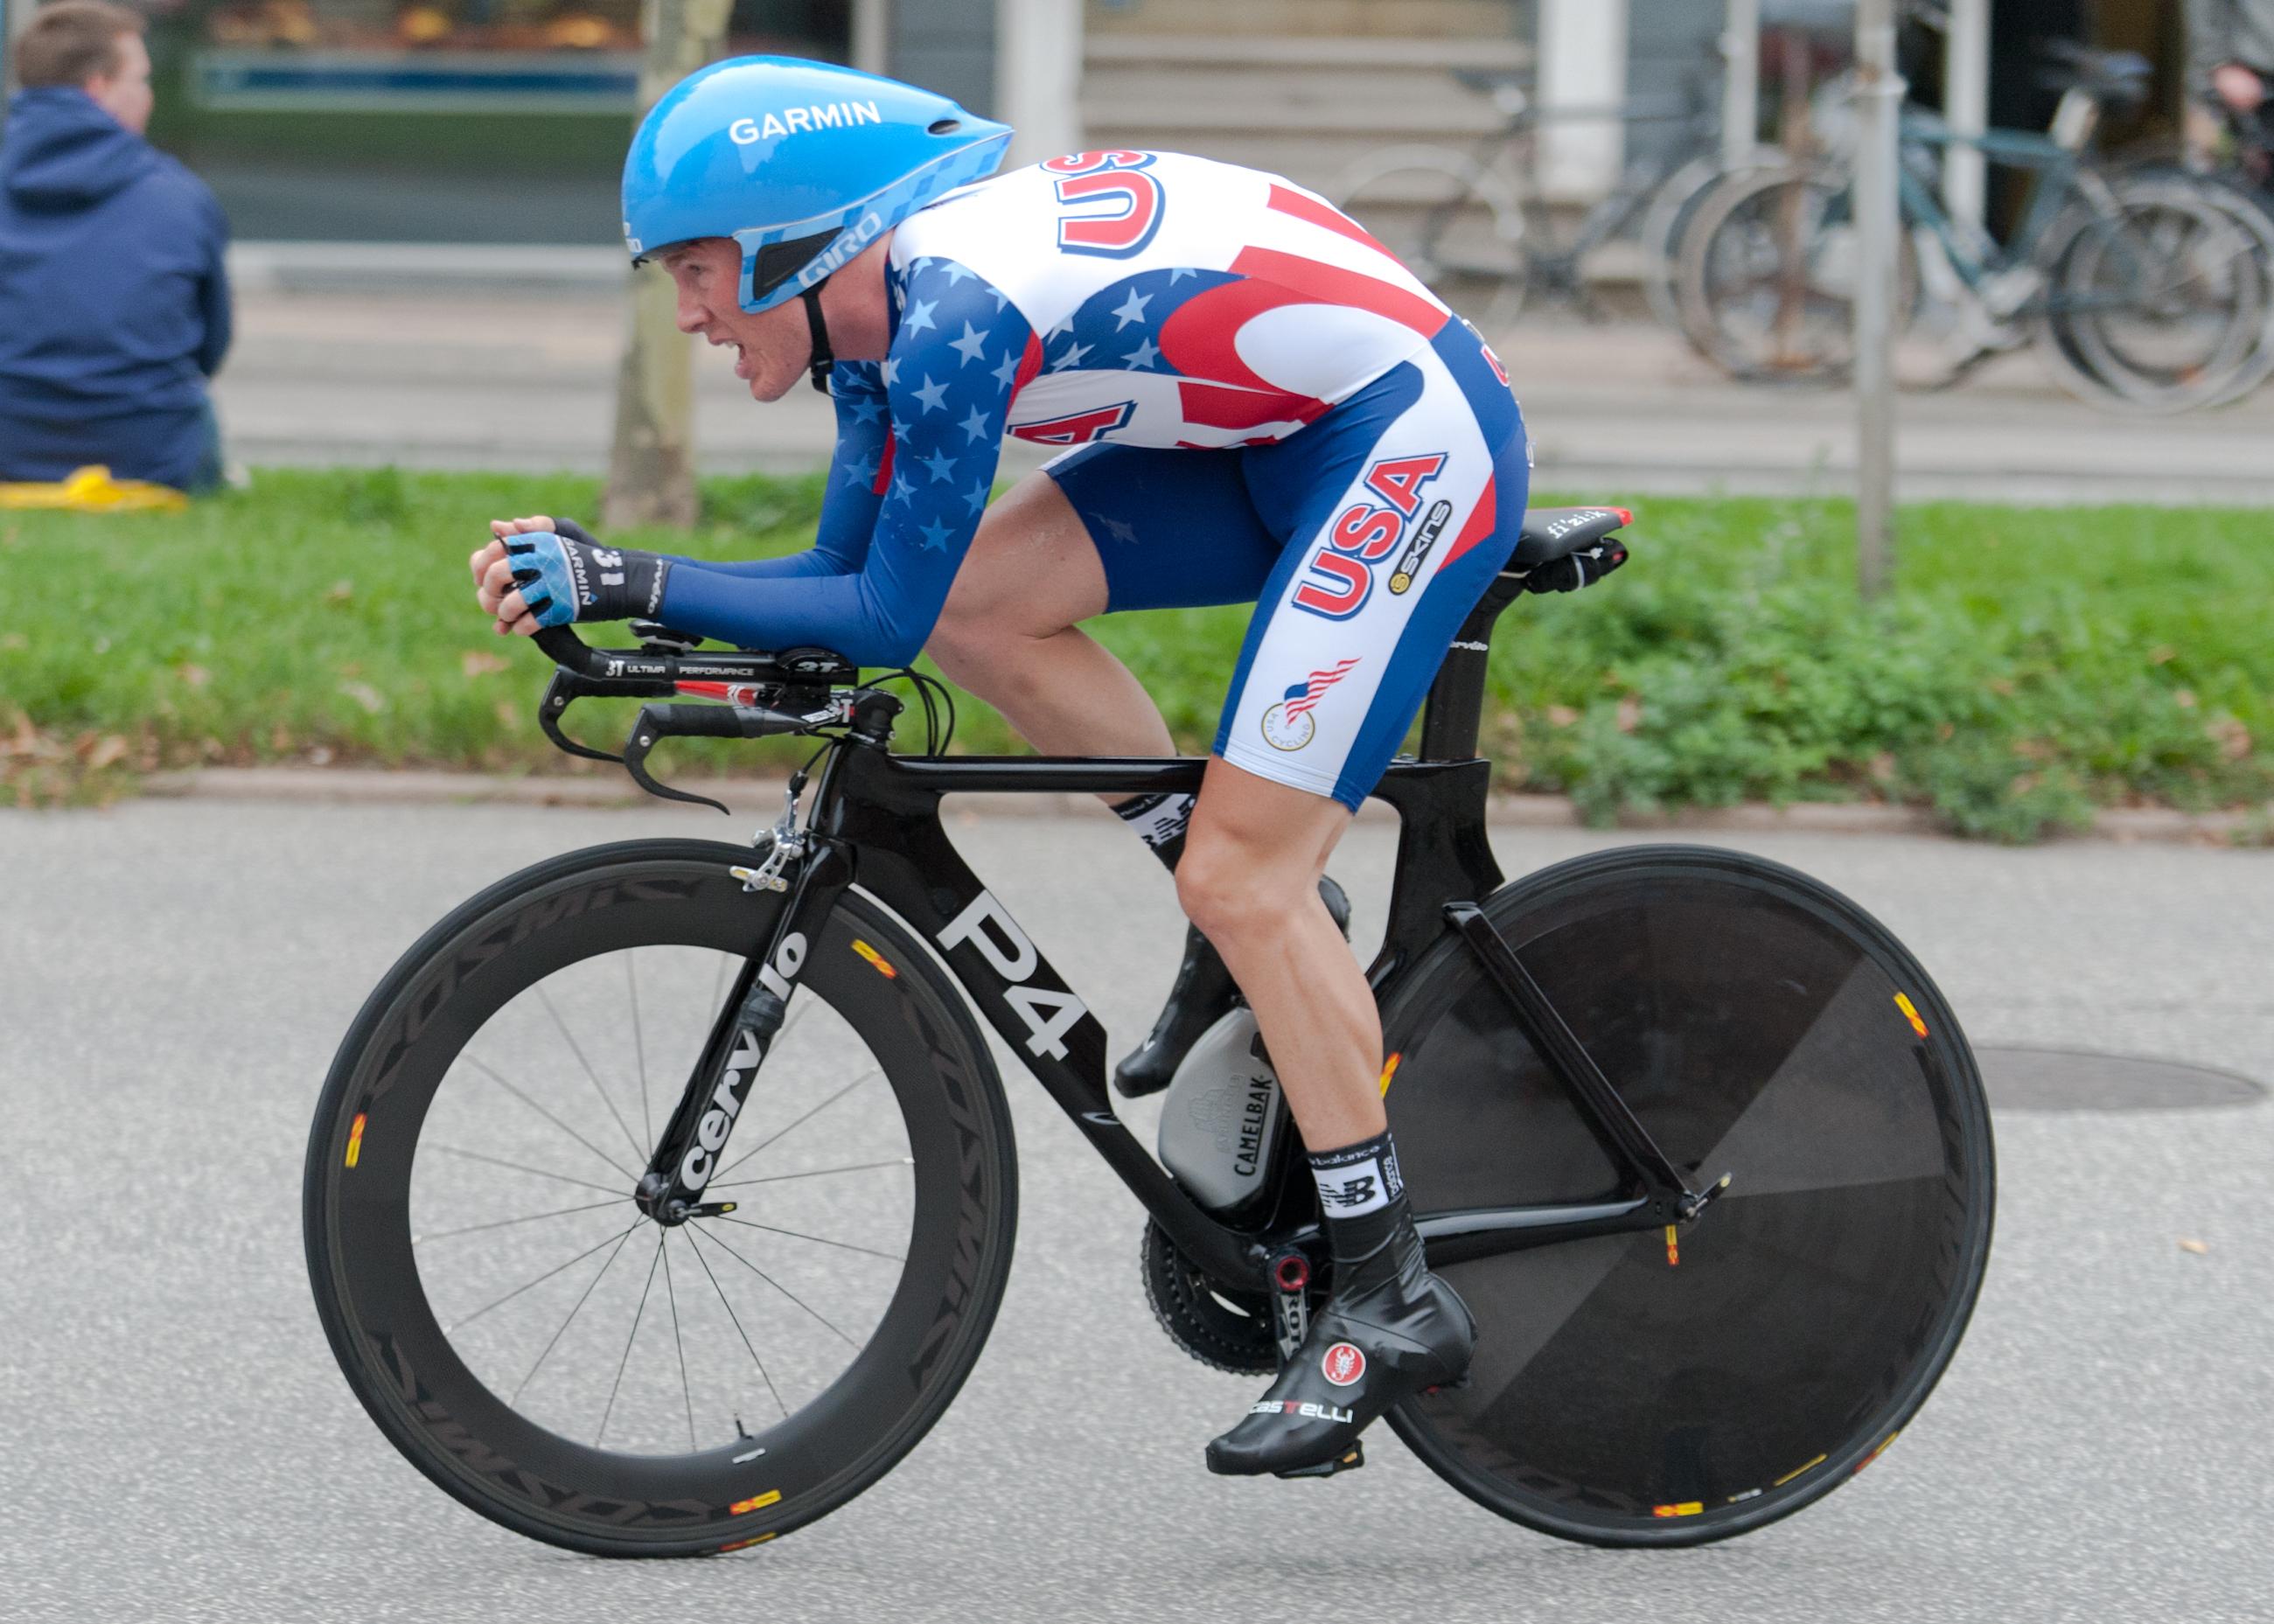 2011 UCI Road World Championship Andrew Talansky